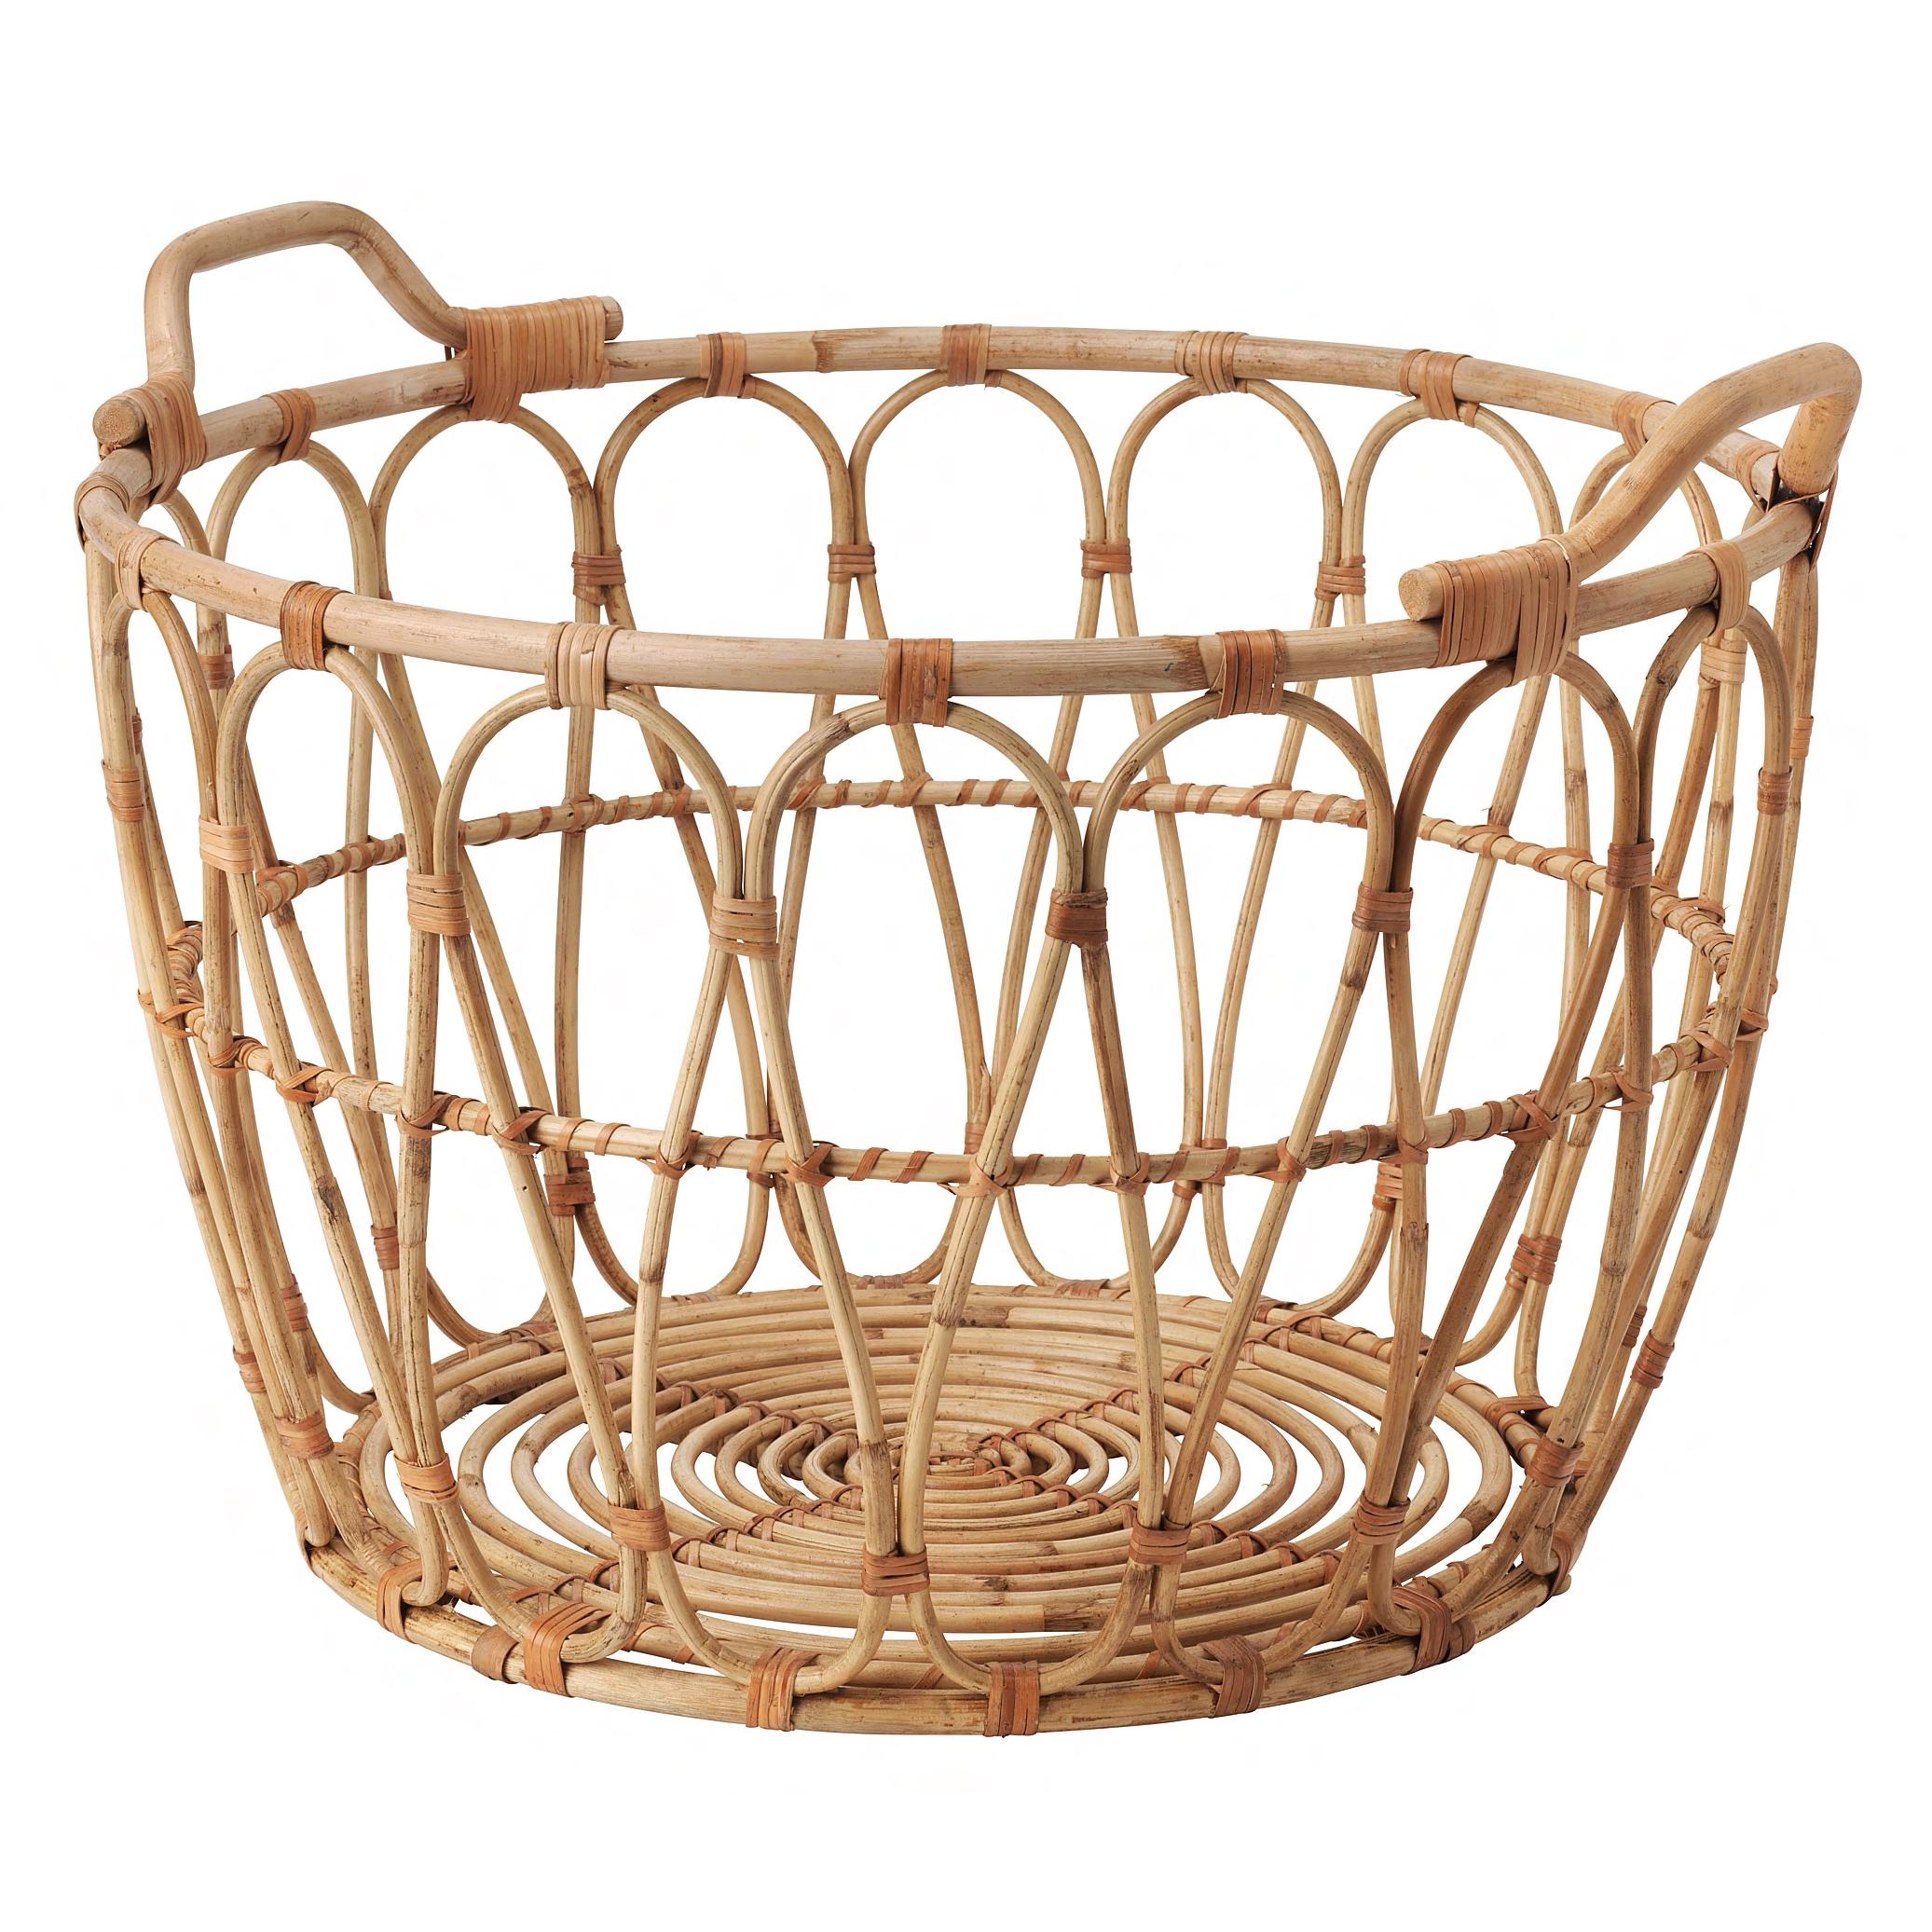 SNIDAD Basket, $28